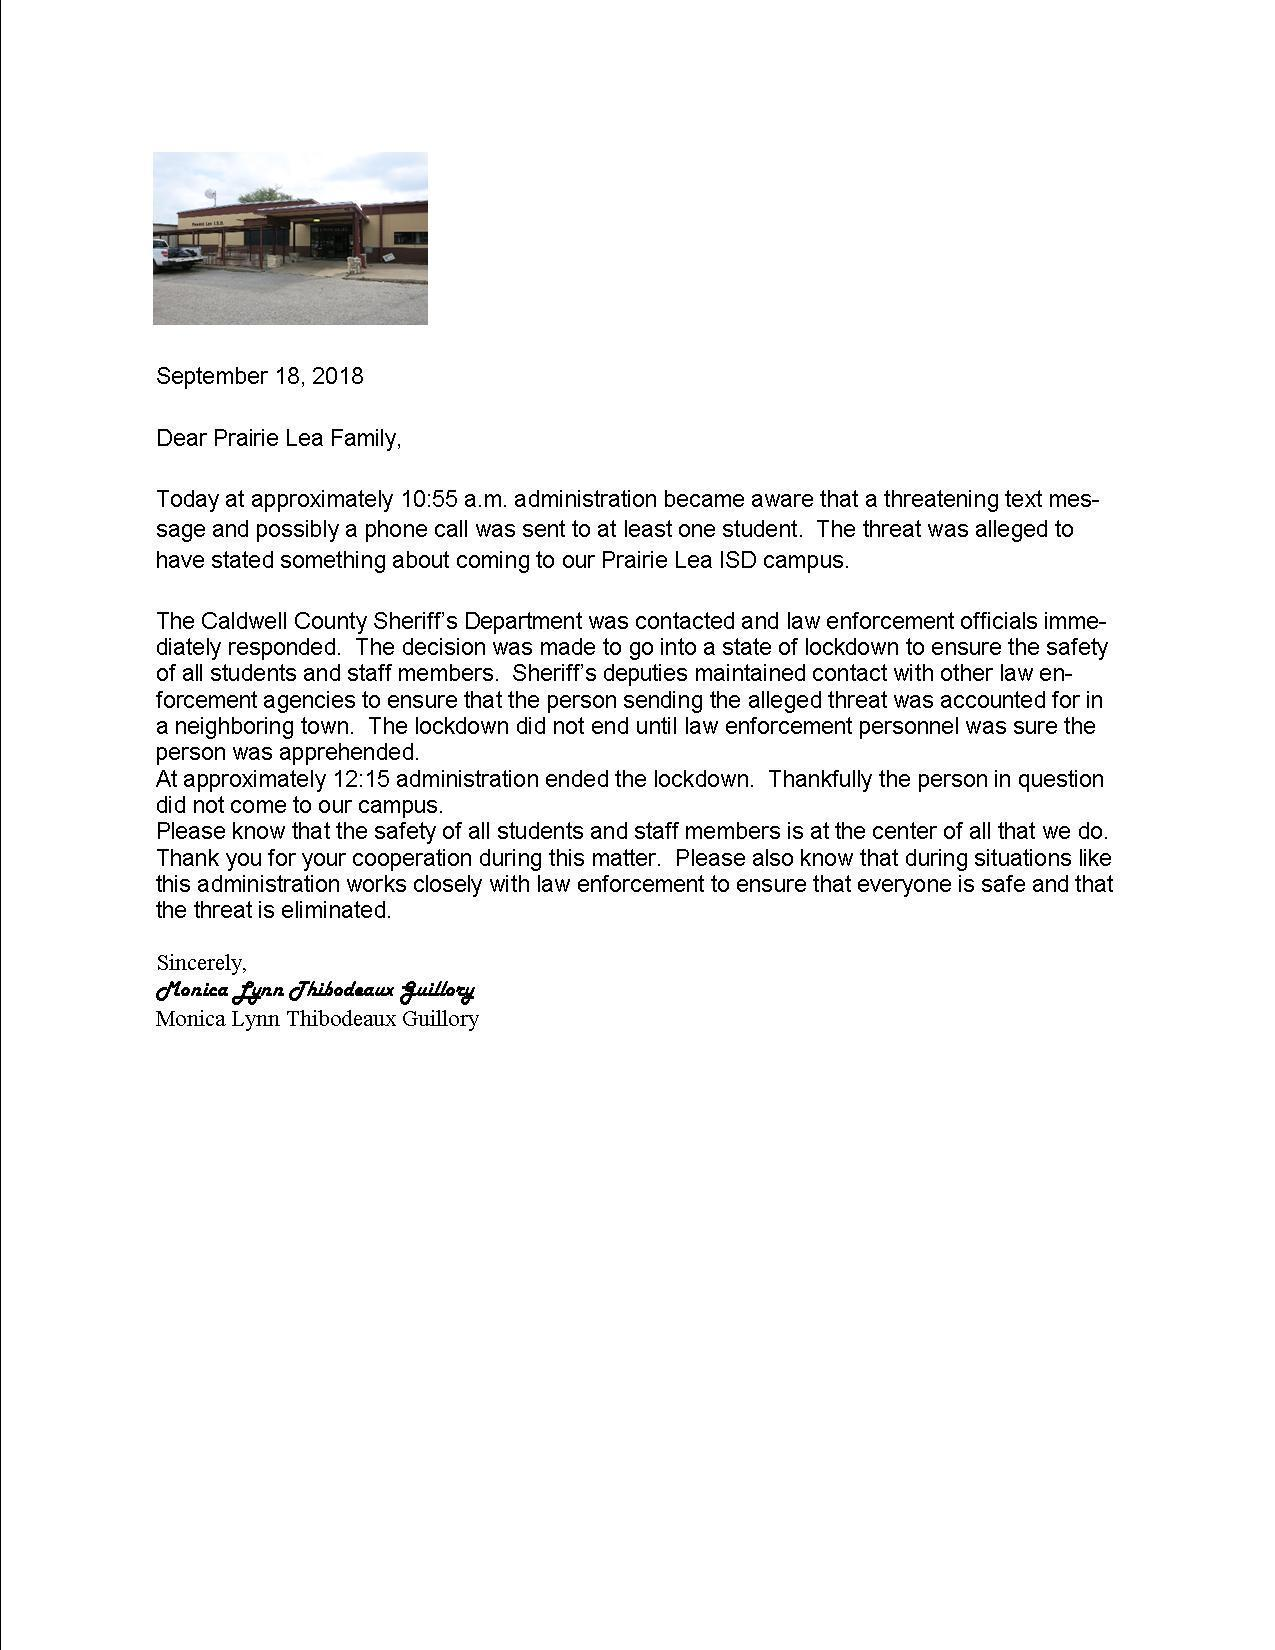 Prairie Lea Independent School District